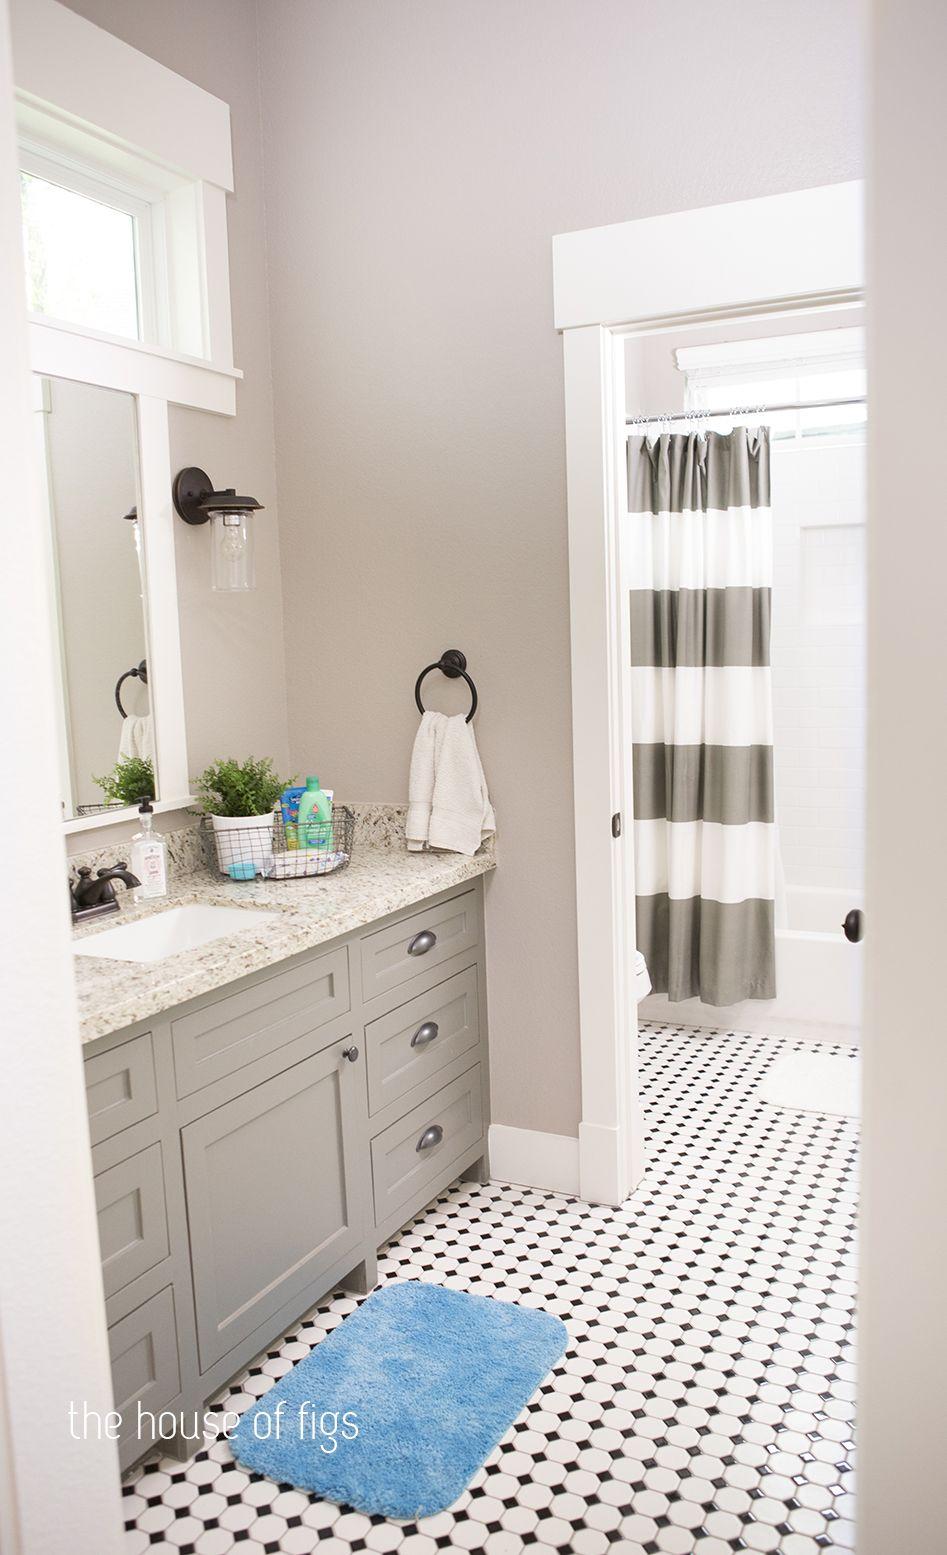 Lame Pvc Salle De Bain Avis ~ downstairs bathroom asia b pinterest salle de bains salle et